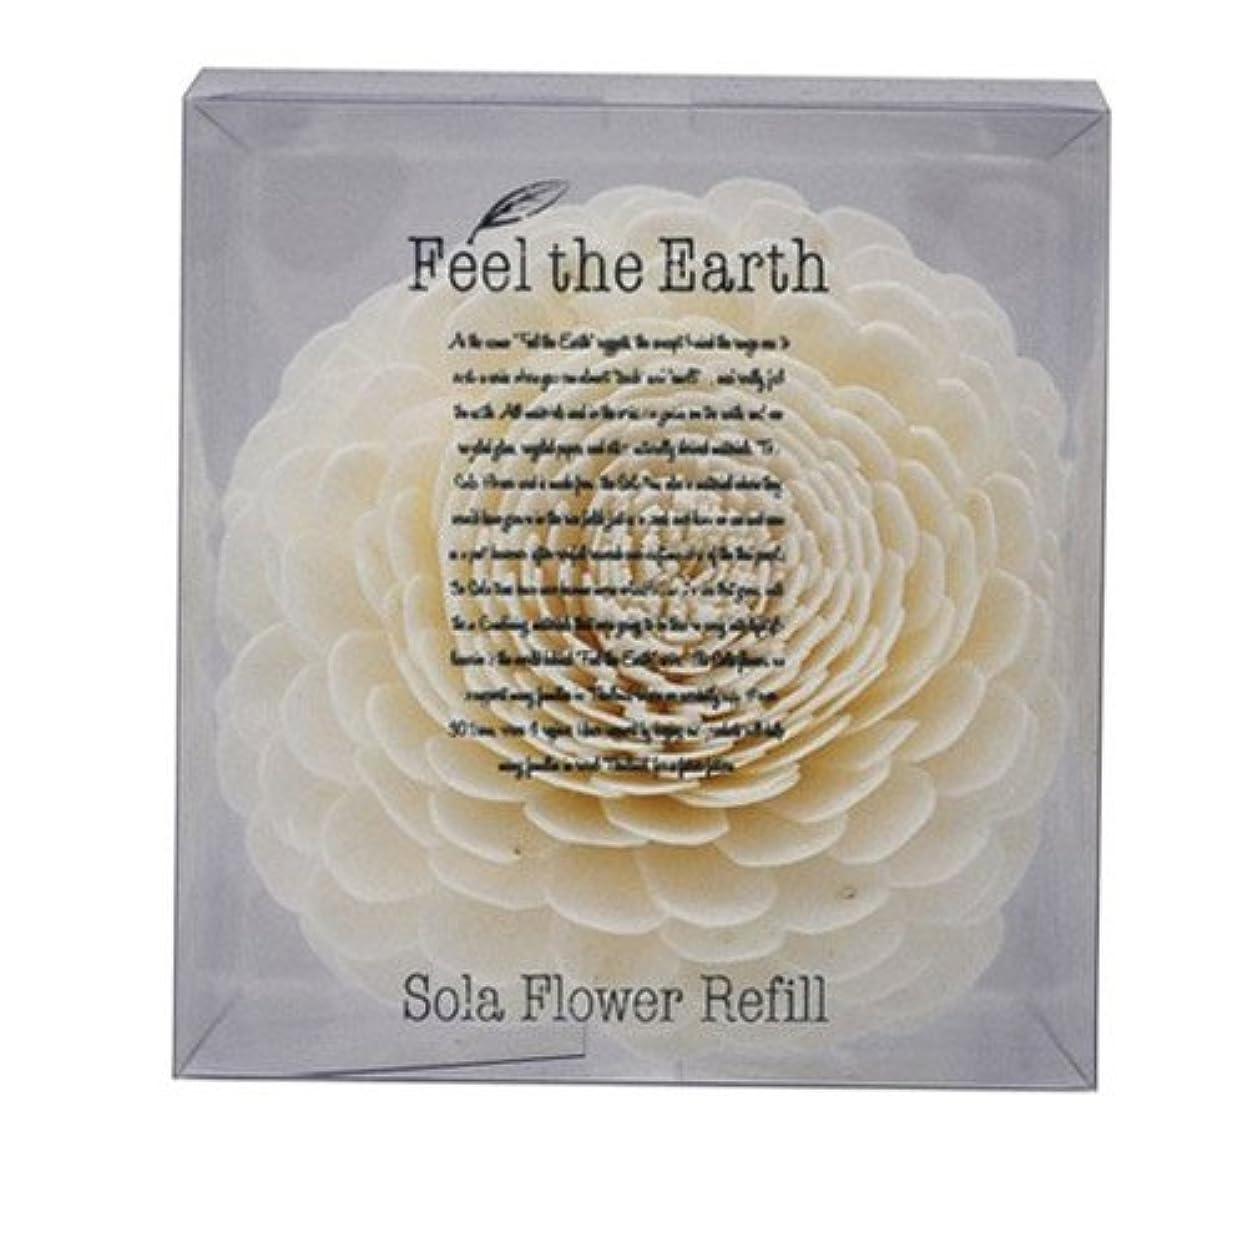 FEEL THE EARTH ソラフラワー リフィル ダリア DAHLIA フィール ジ アース